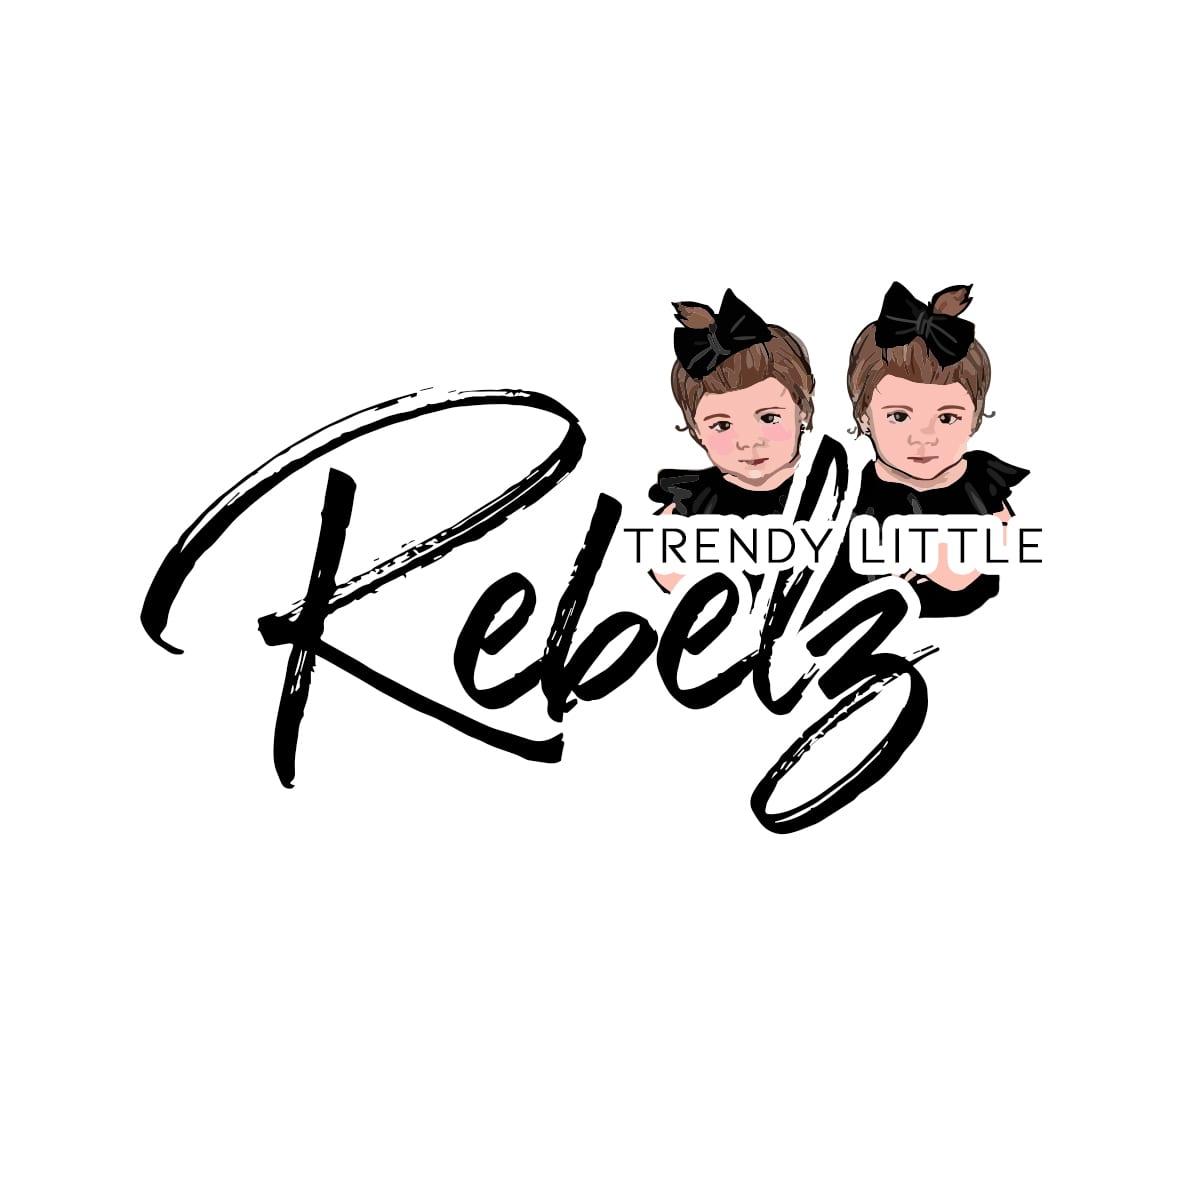 Trendy-Little-Rebels-Logo-007-No-Girlz-Final_FB_Profile-02